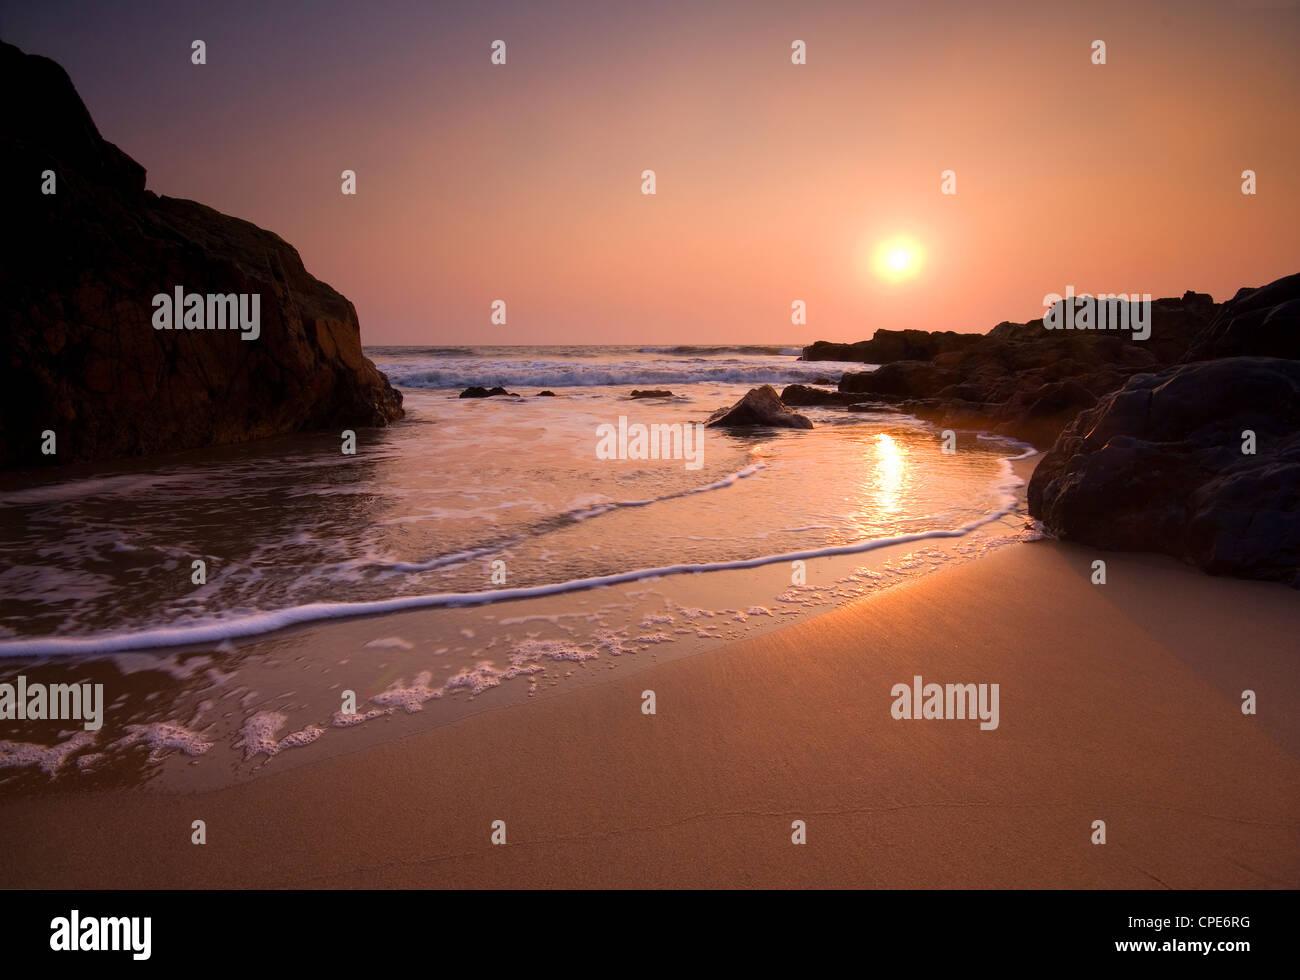 Arambol Beach, Goa, Indien, Asien Stockbild